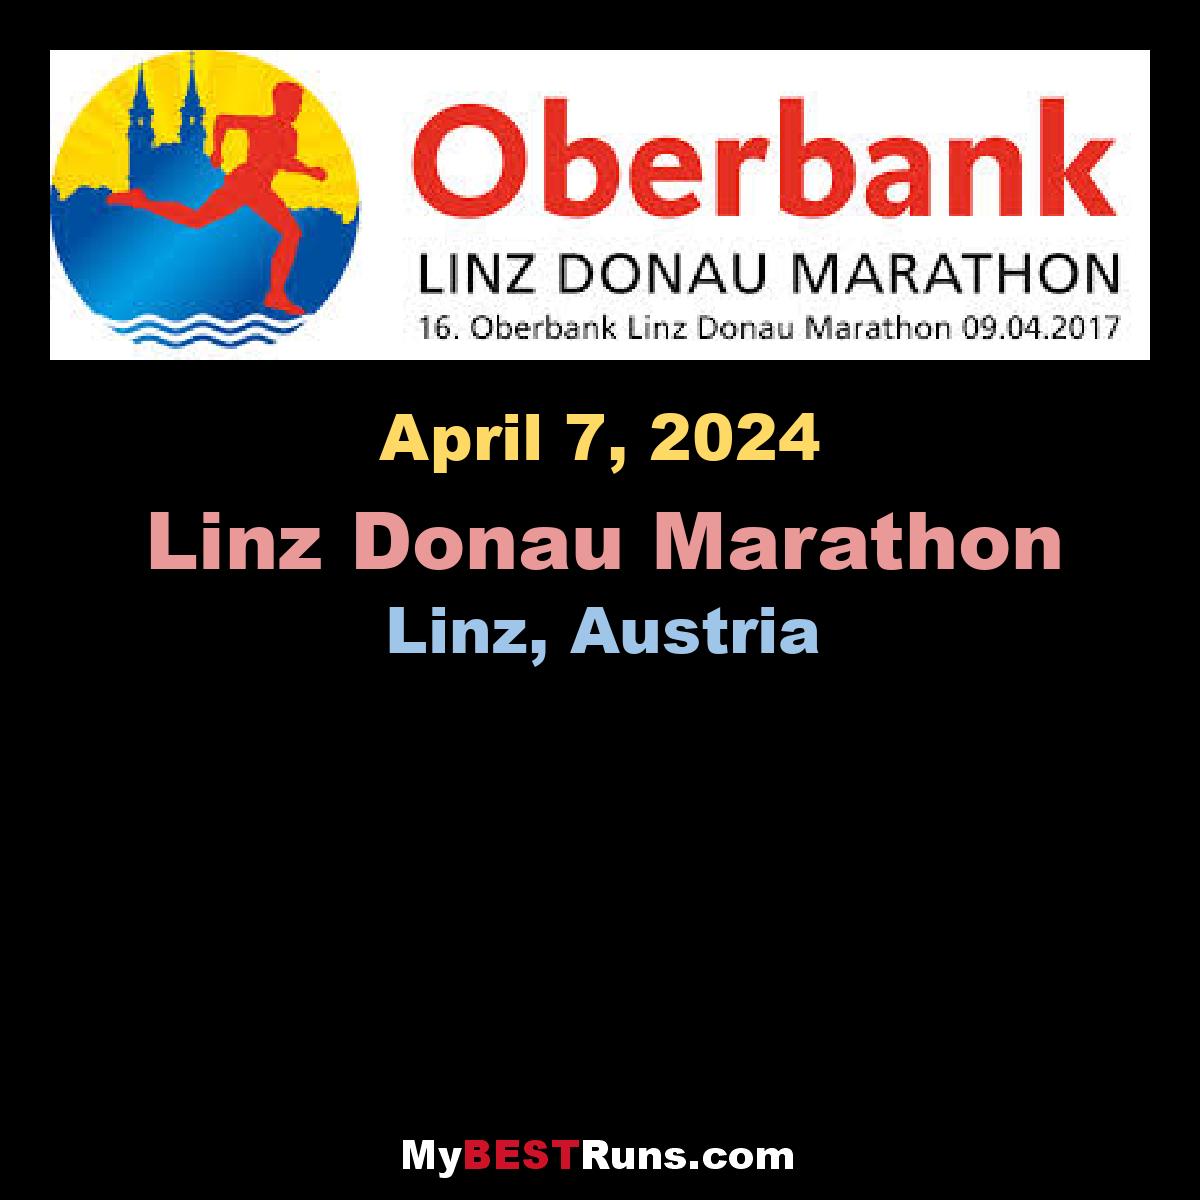 Linz Donau Marathon